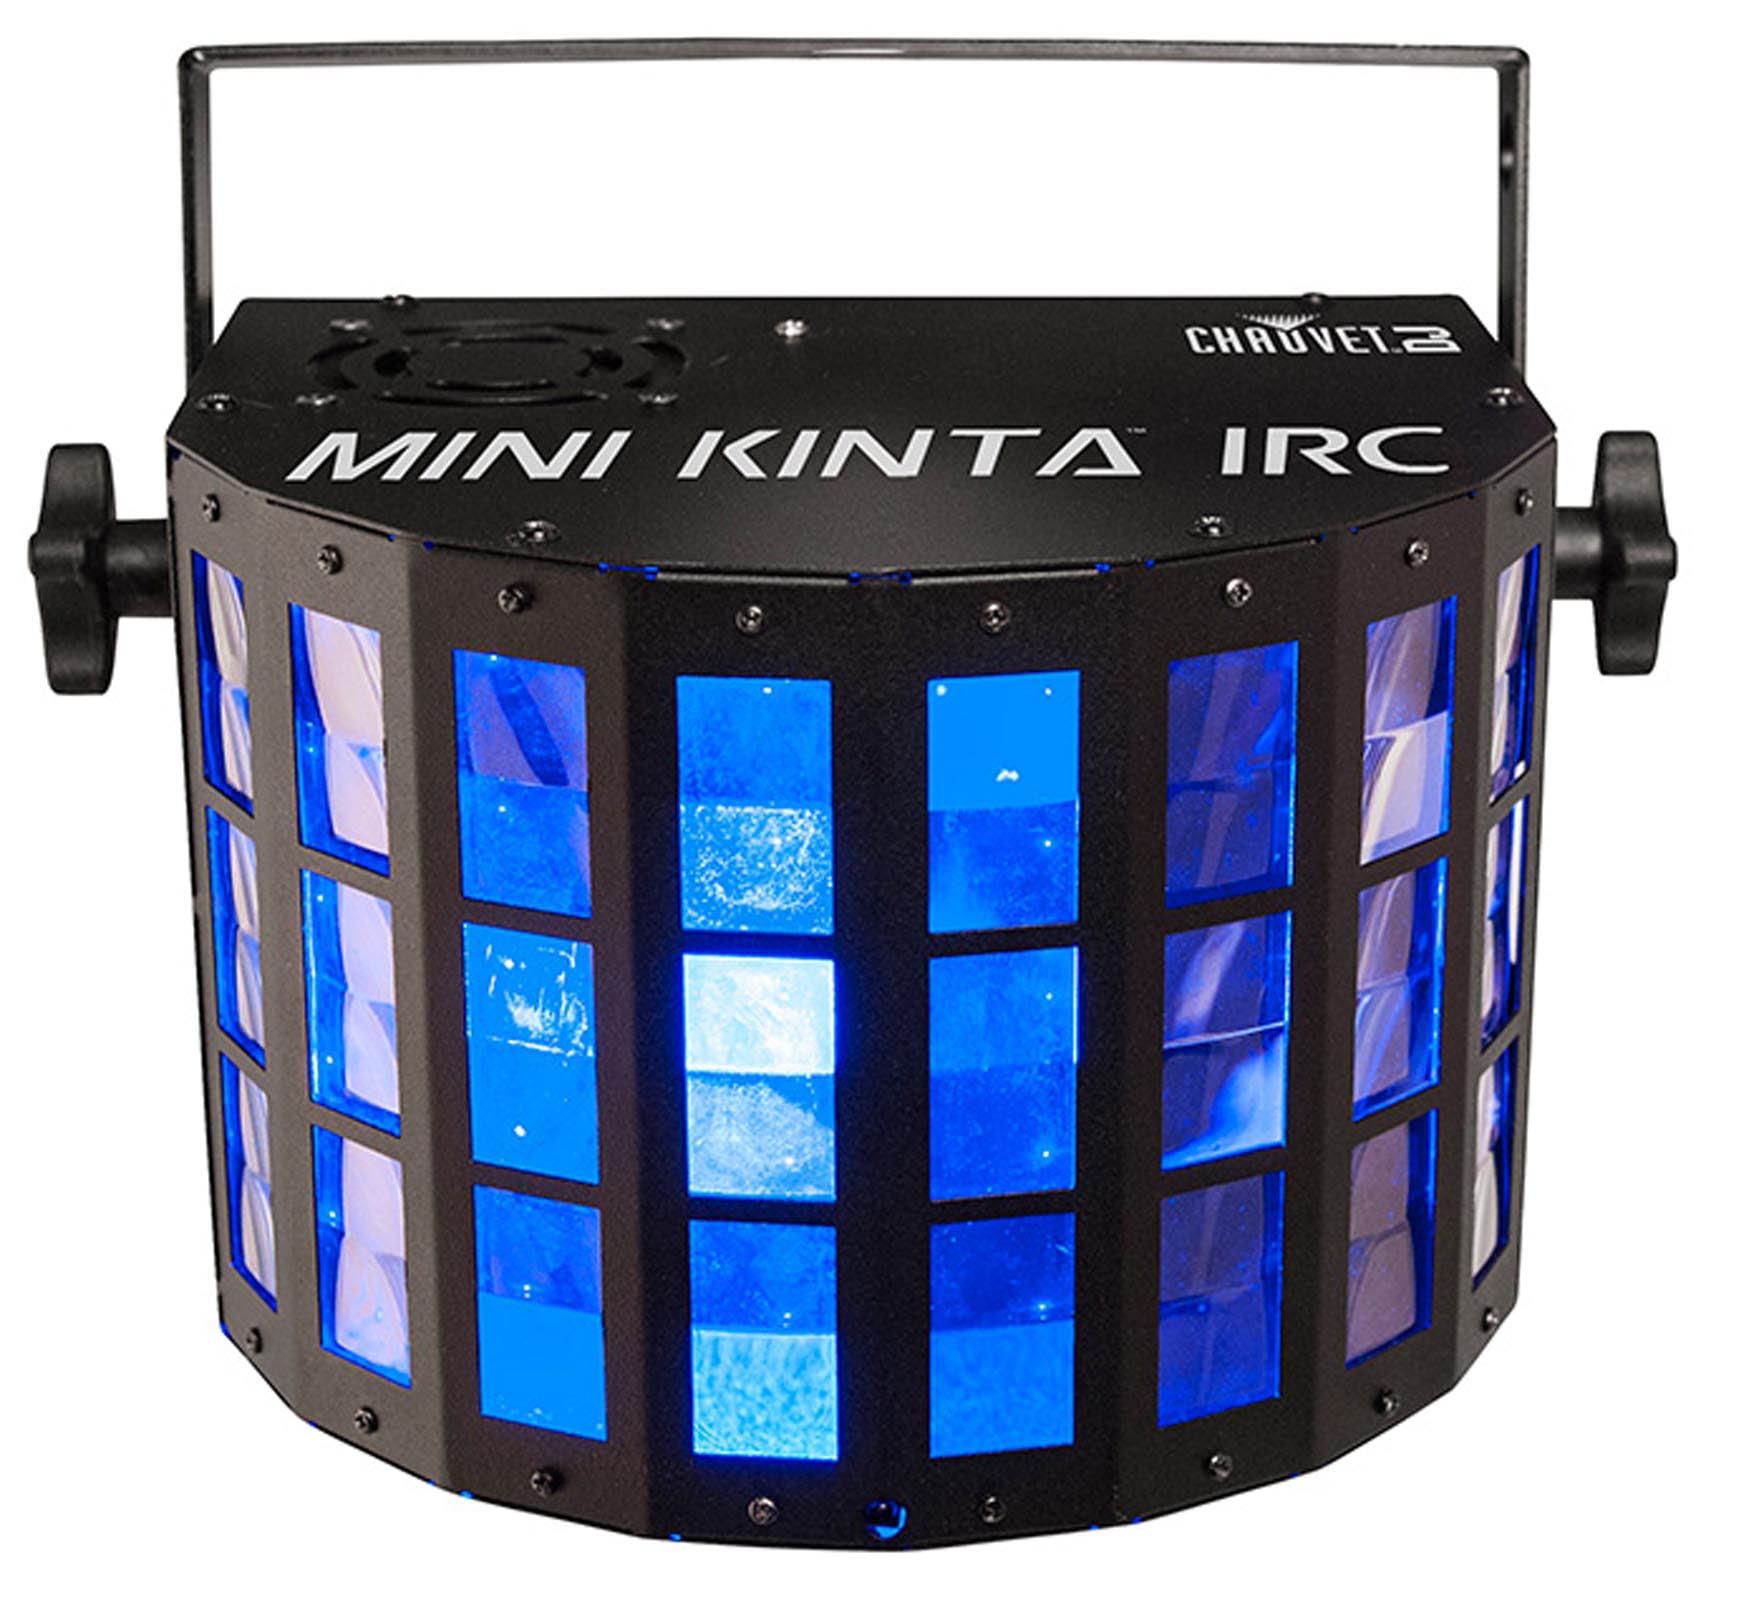 Chauvet DJ MINIKINTAIRC Mini Kinta IRC Effect Light